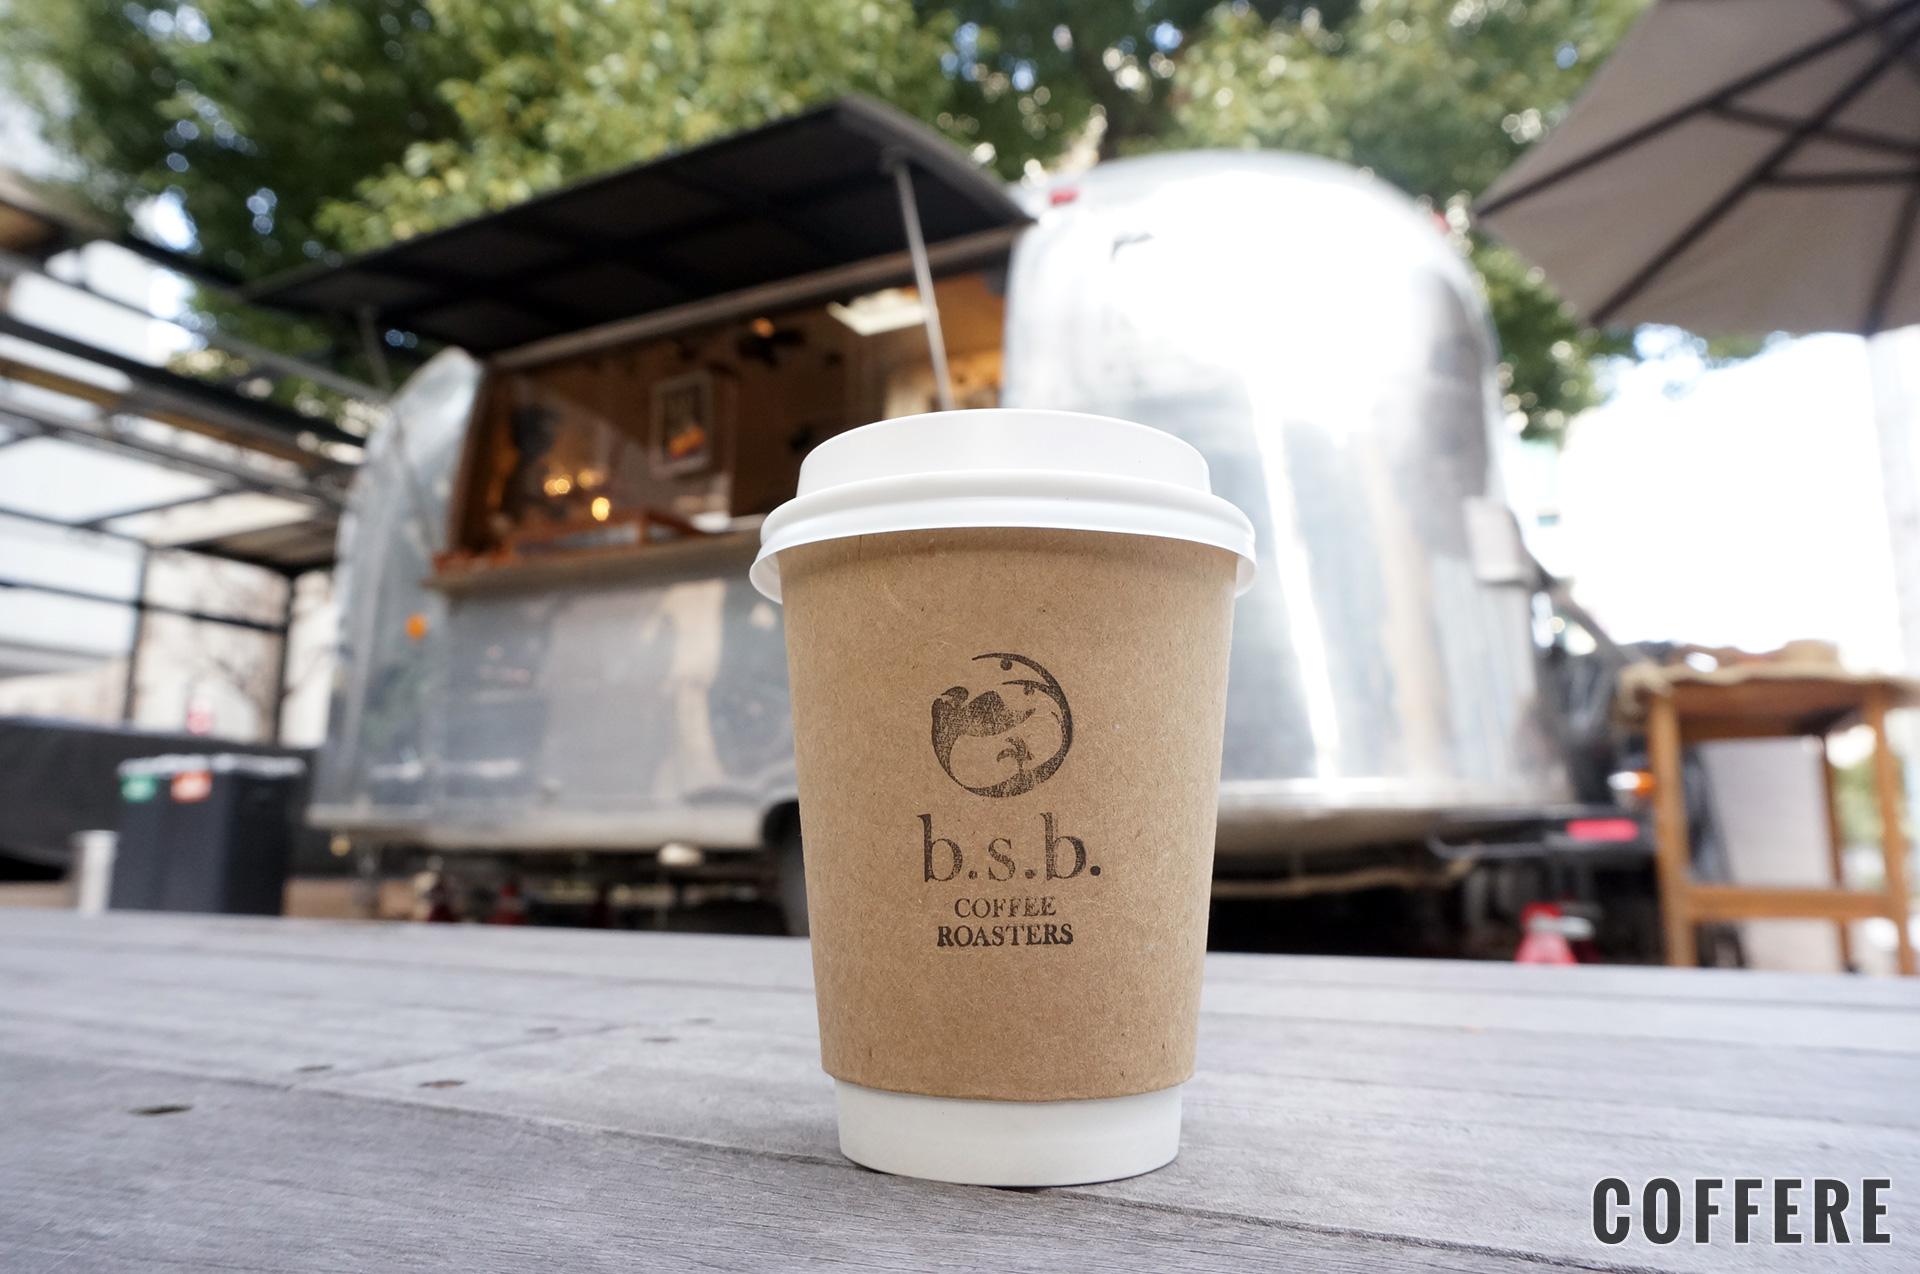 b.s.b. COFFEE ROASTERSのテイクアウトカップ